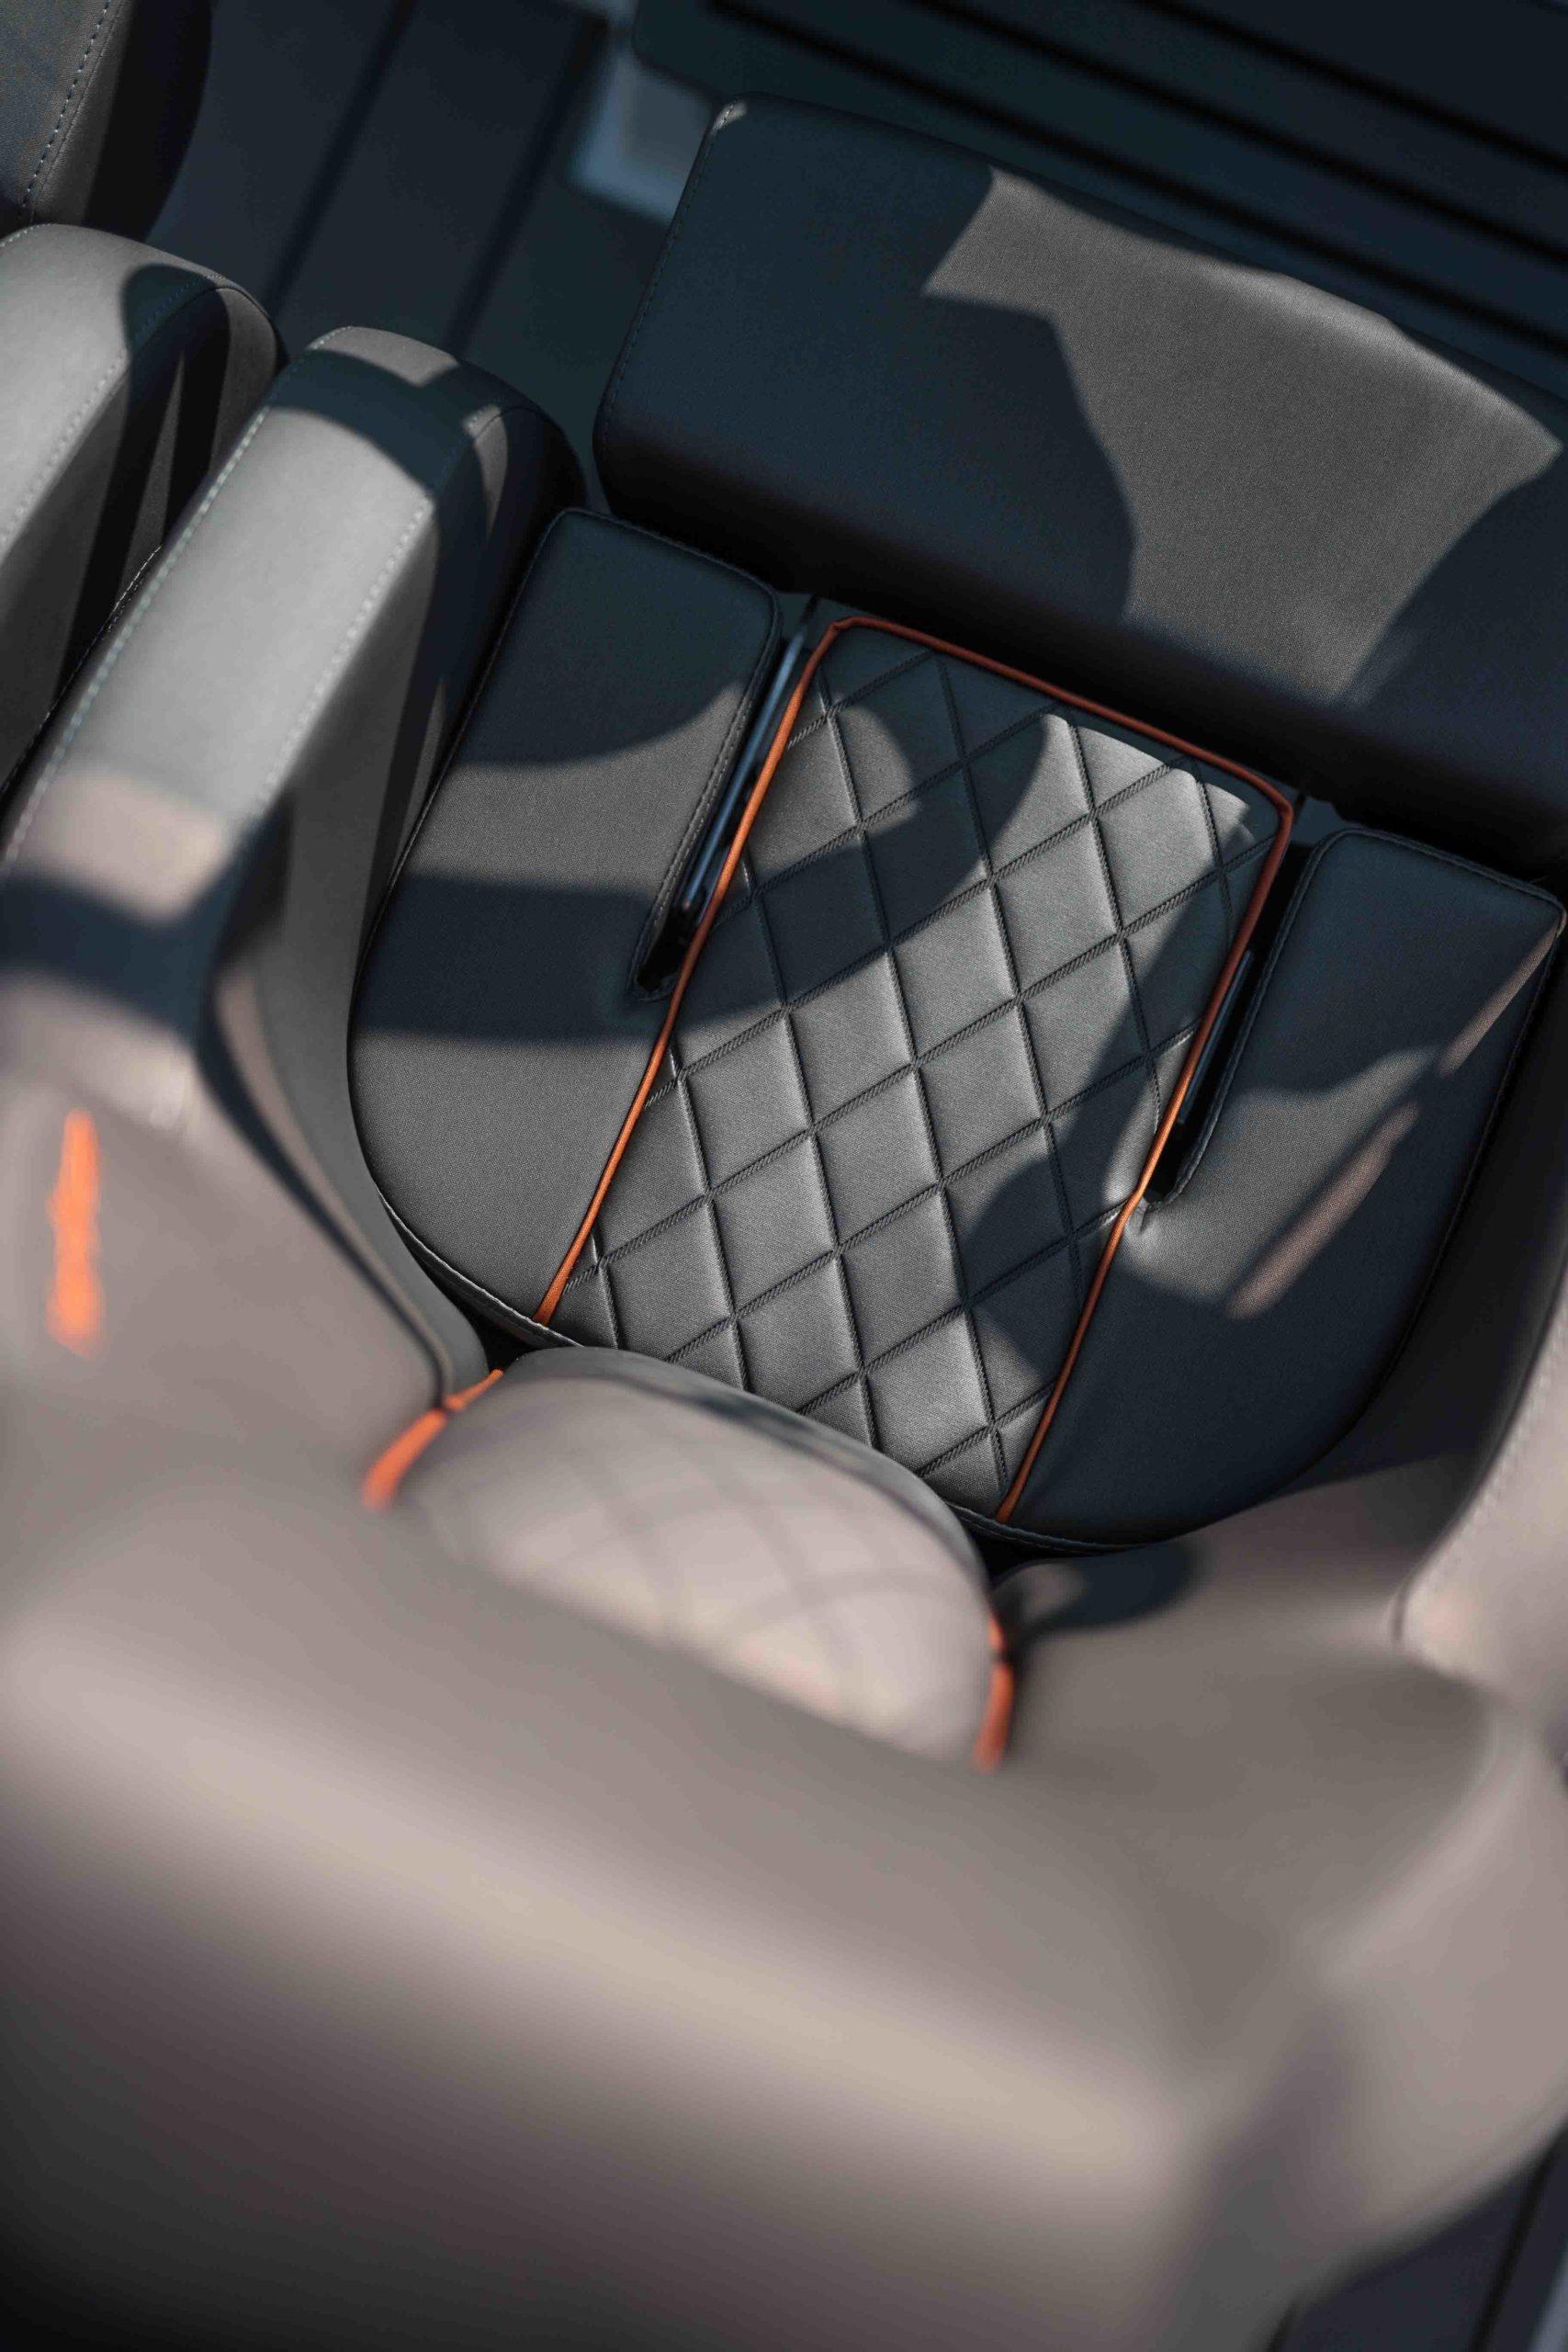 LR_Enduro 805 details - drivers seat